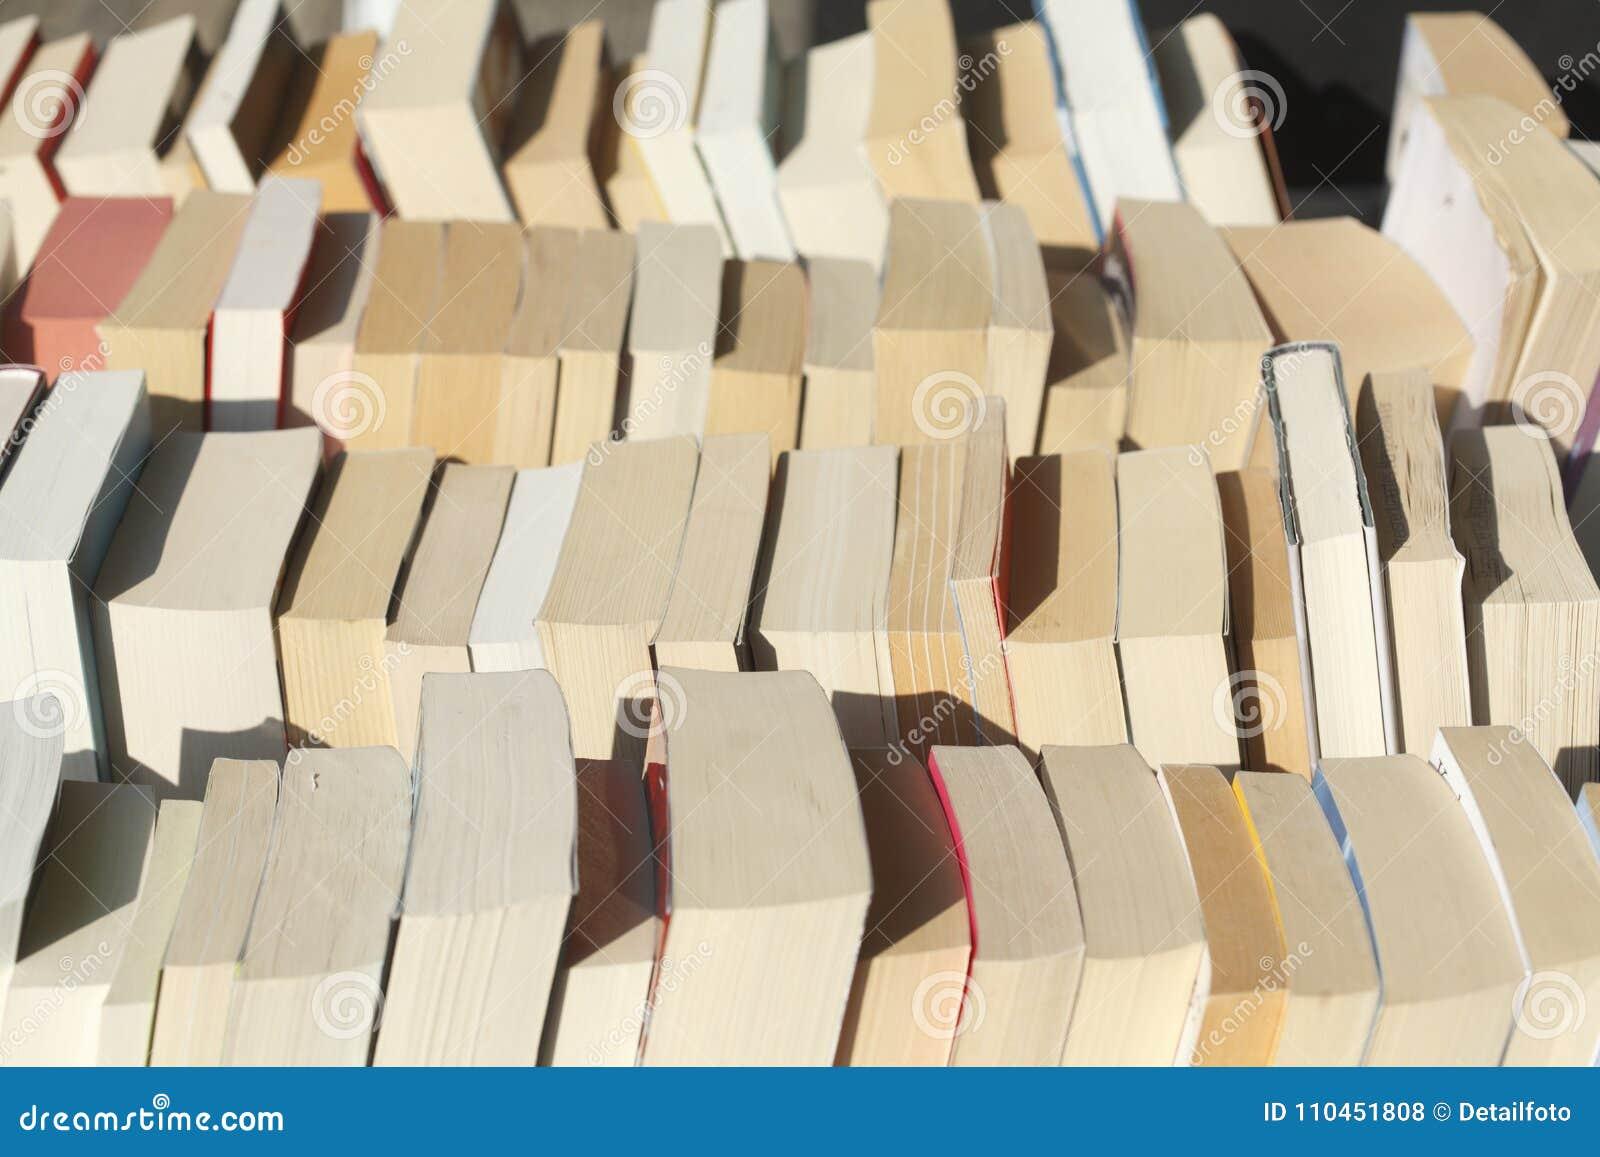 Gamla häftade böcker i en bokhylla